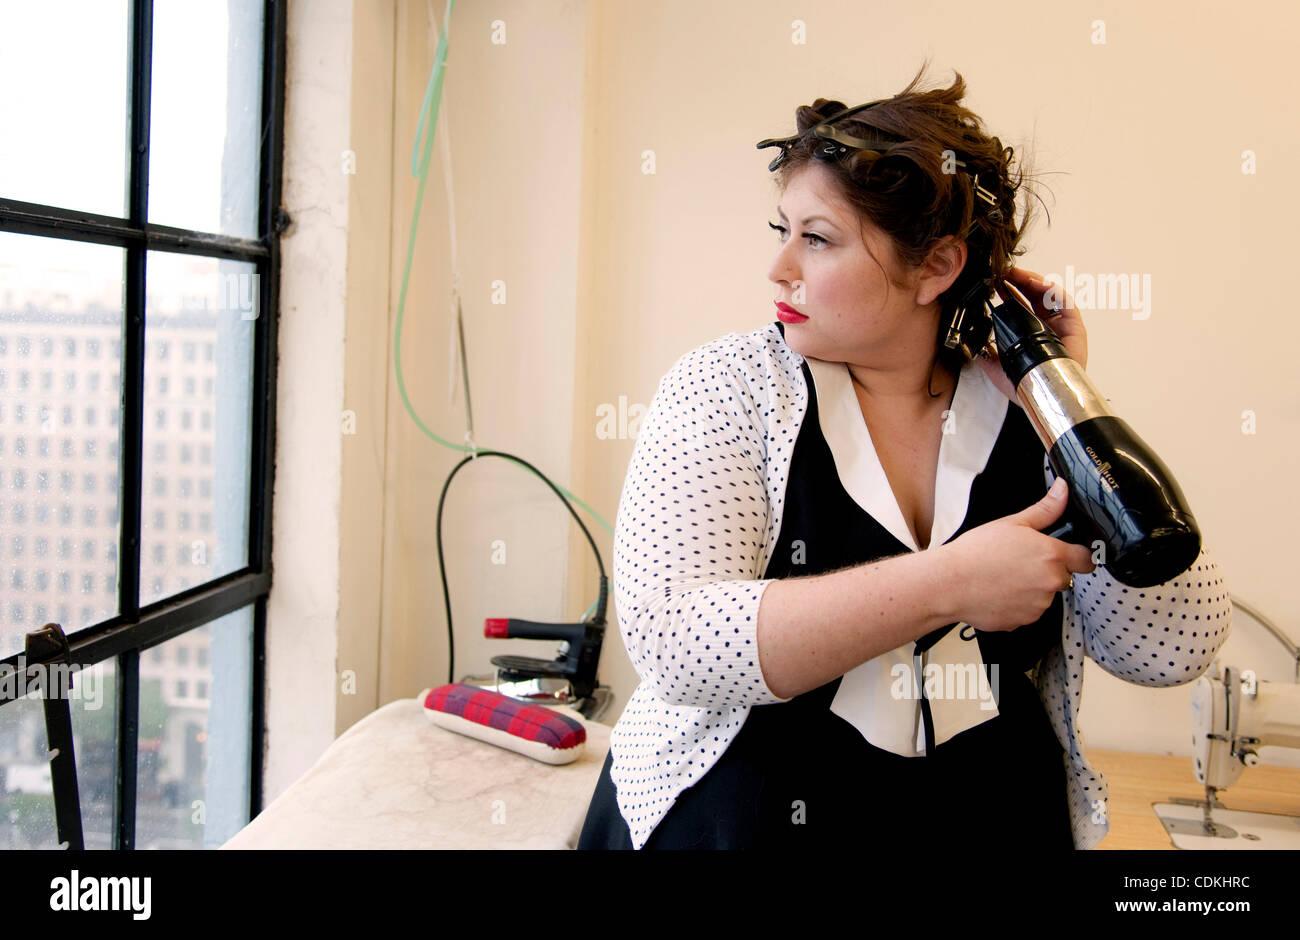 20 Marz 2011 Los Angeles Kalifornien Usa Amber Fimbres